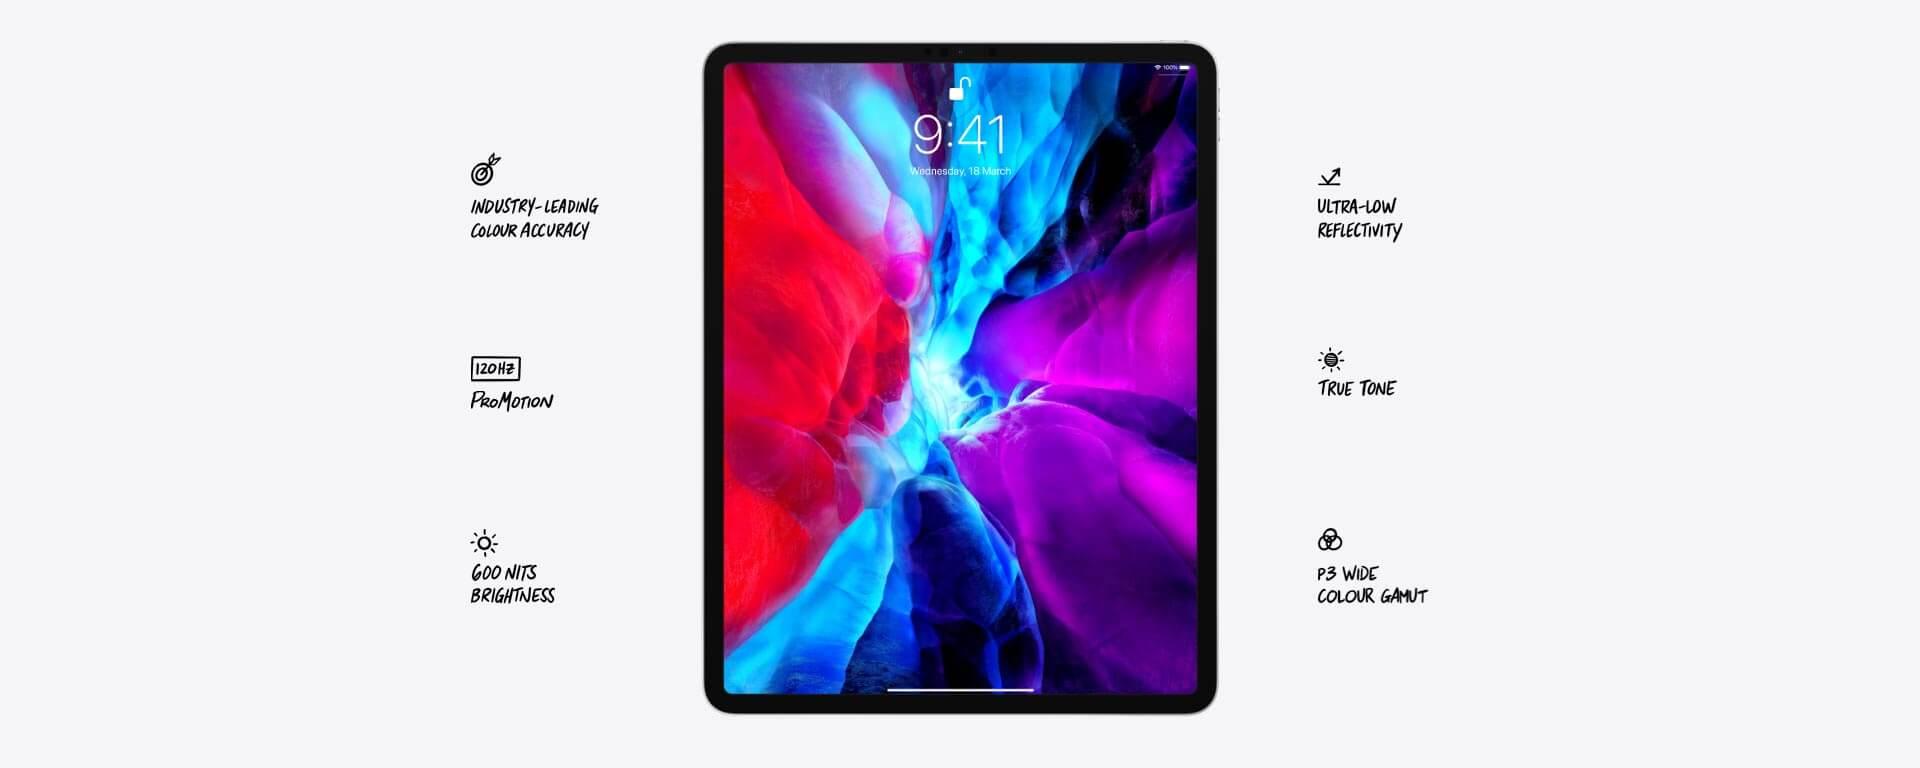 Apple IPad Pro 12.9 price in india